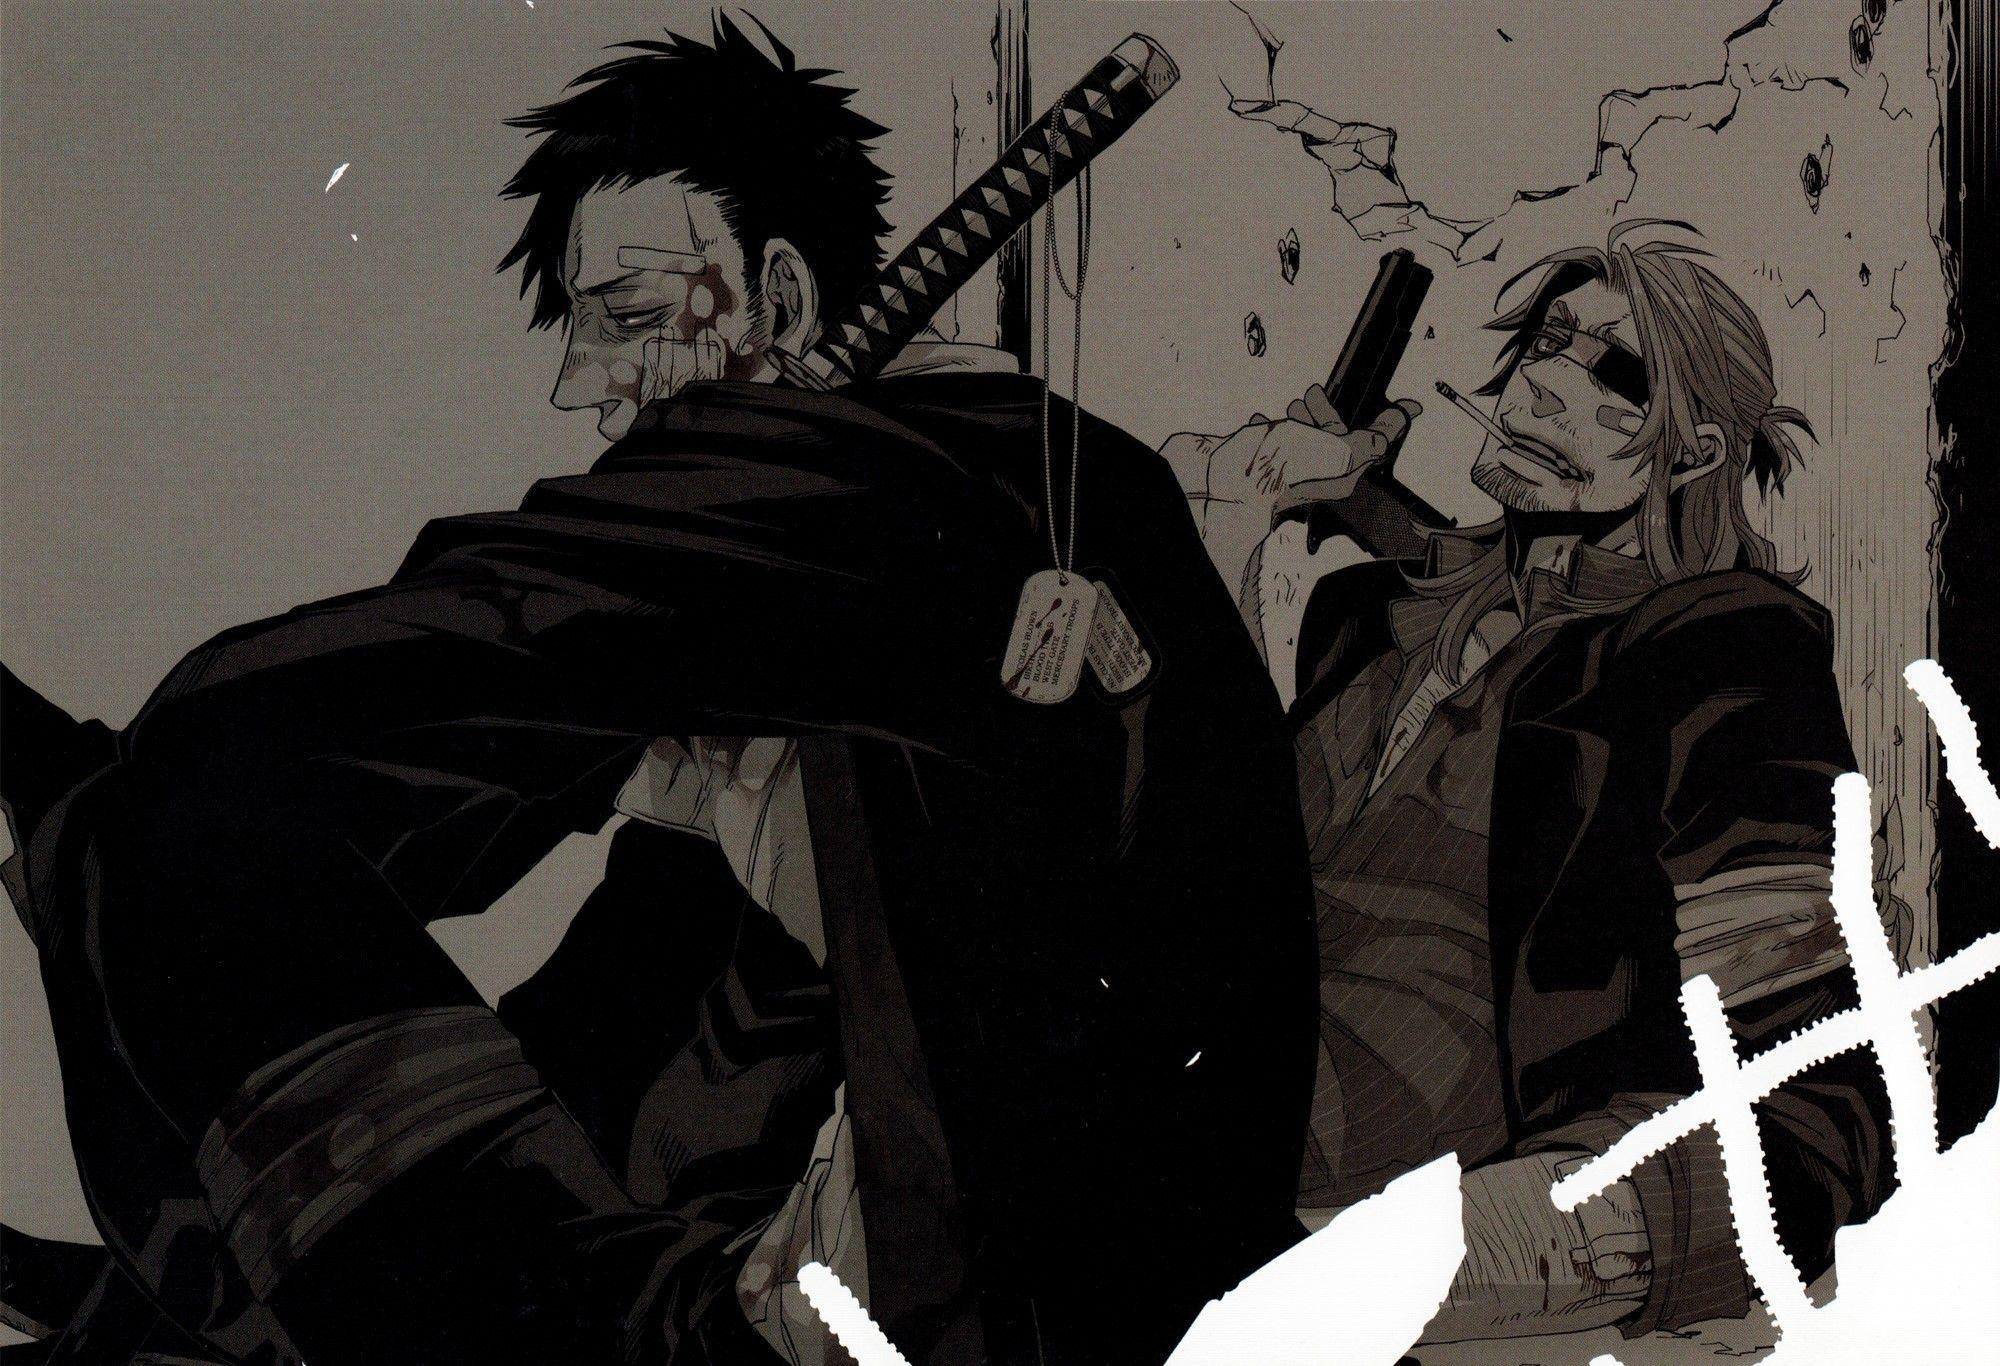 80 Gangsta Anime Wallpapers On Wallpaperplay Gangsta Anime Anime Gangster Gangsta